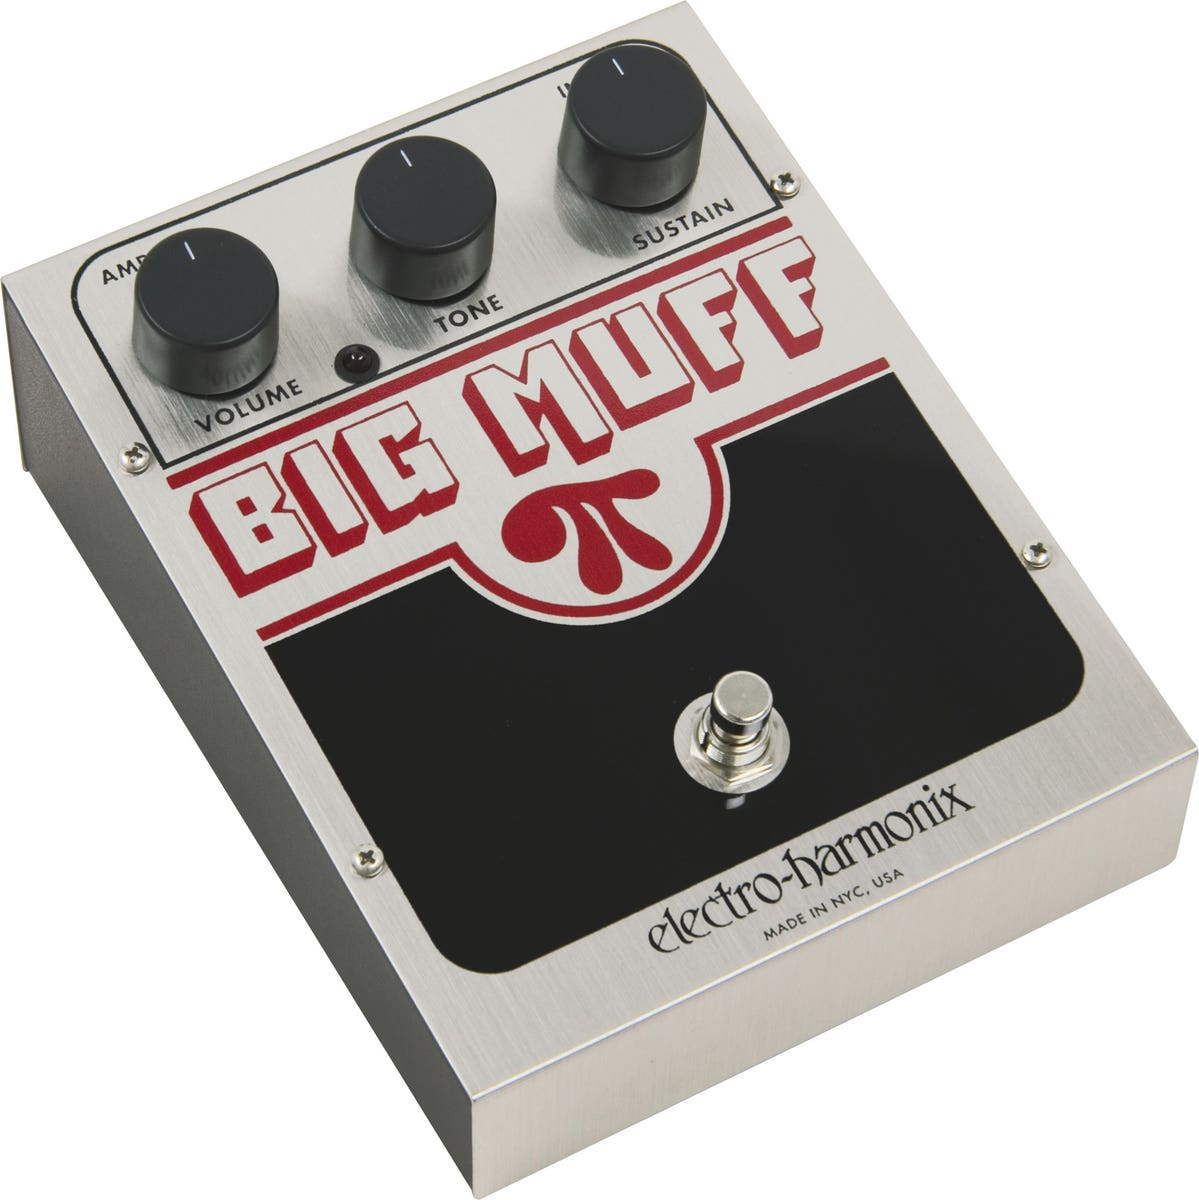 Electro Harmonix USA Big Muff PI Fuzz Pedal